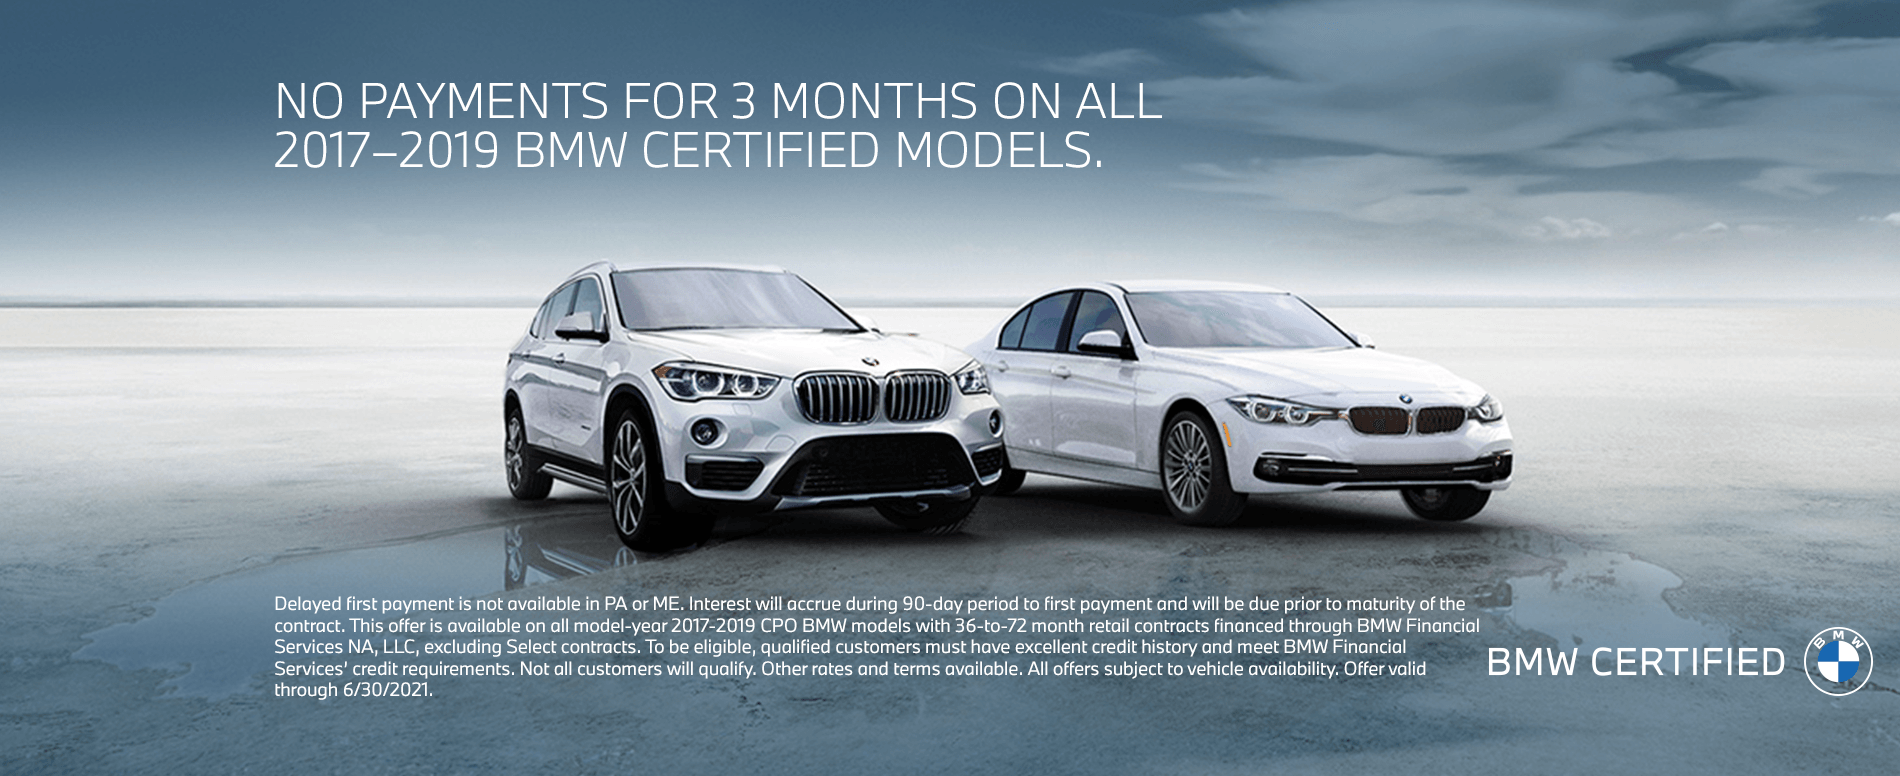 Certifed BMW offer